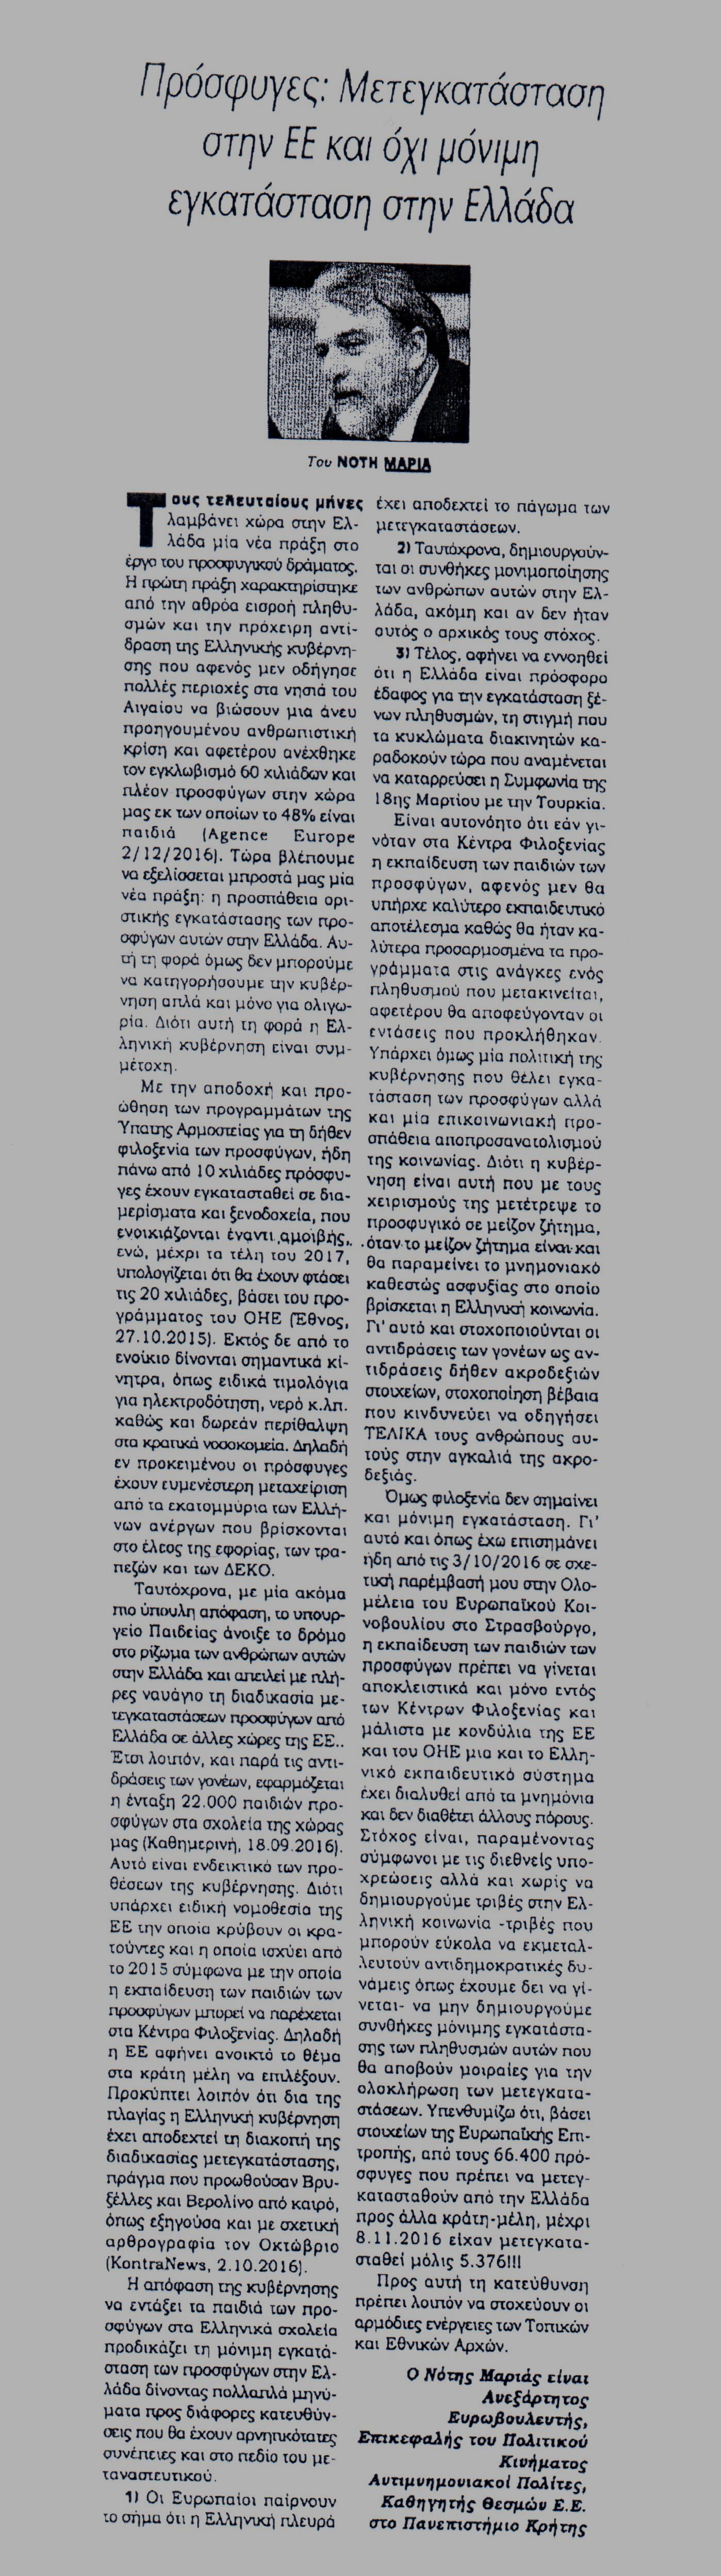 kontra-news-04-12-2016